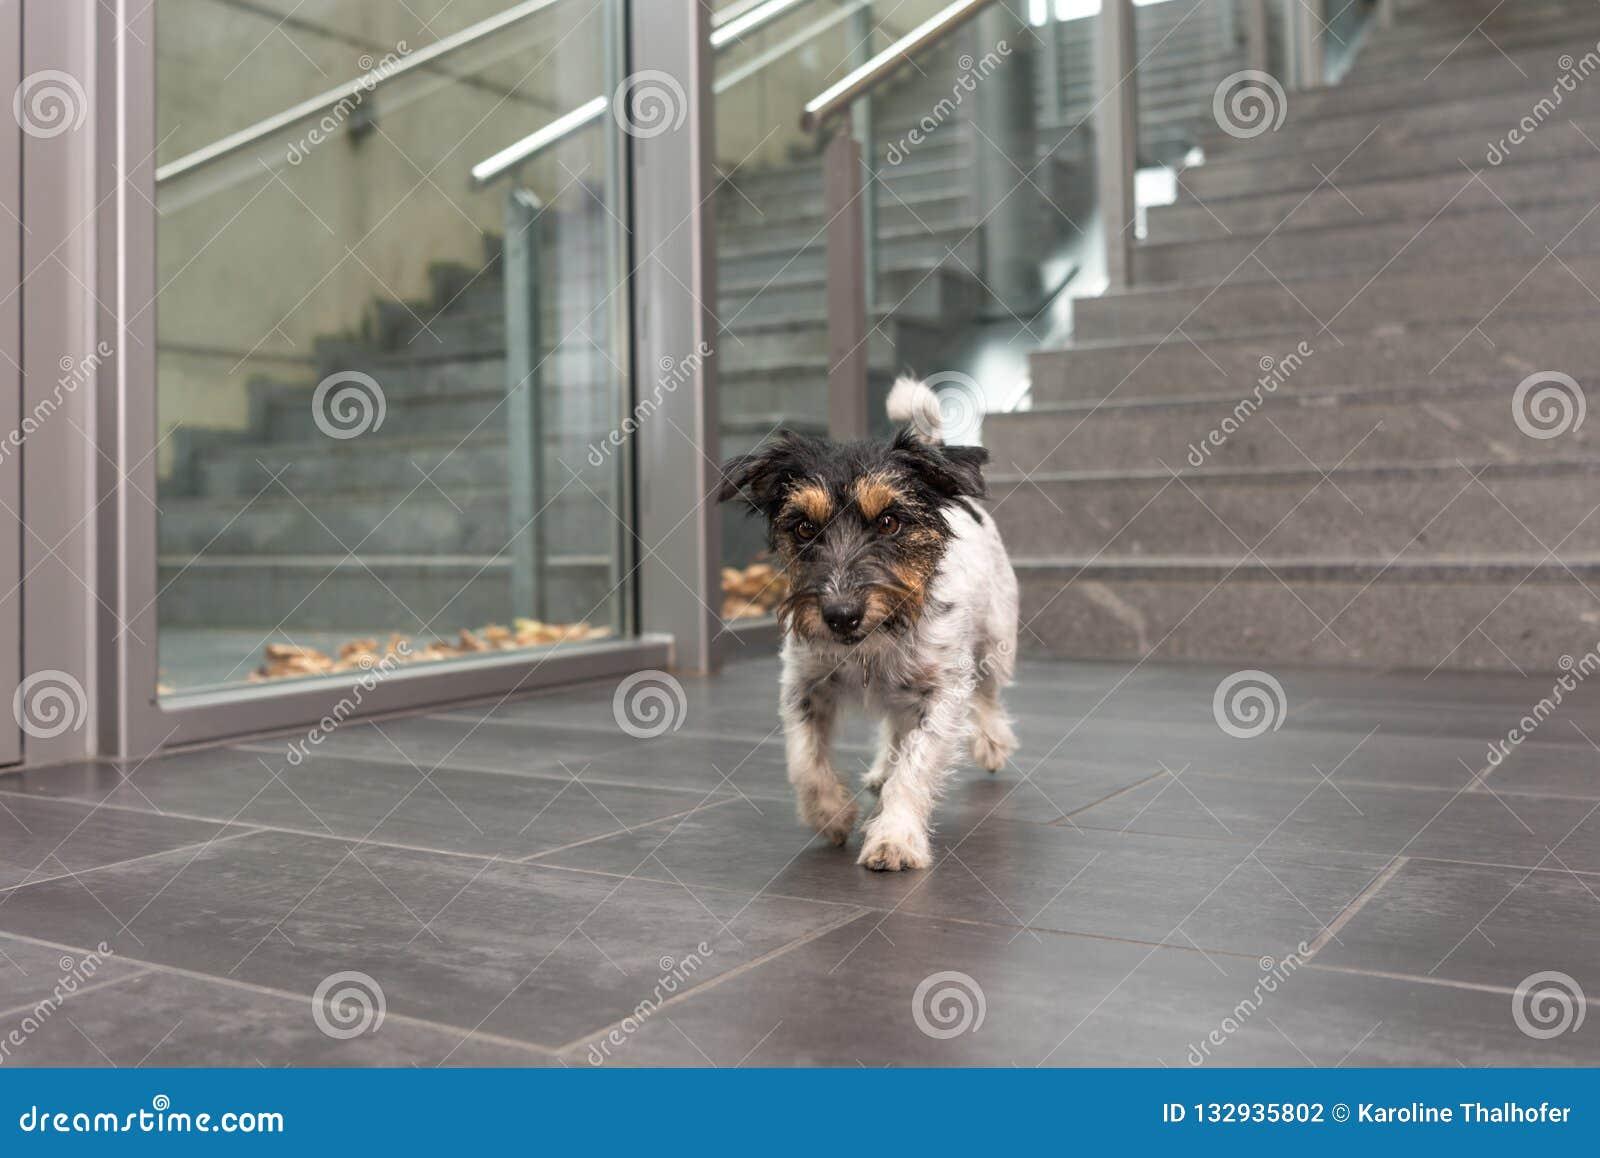 Ist σκυλιών του Jack Russell που τρέχουν σε ένα δημόσιο κτίριο